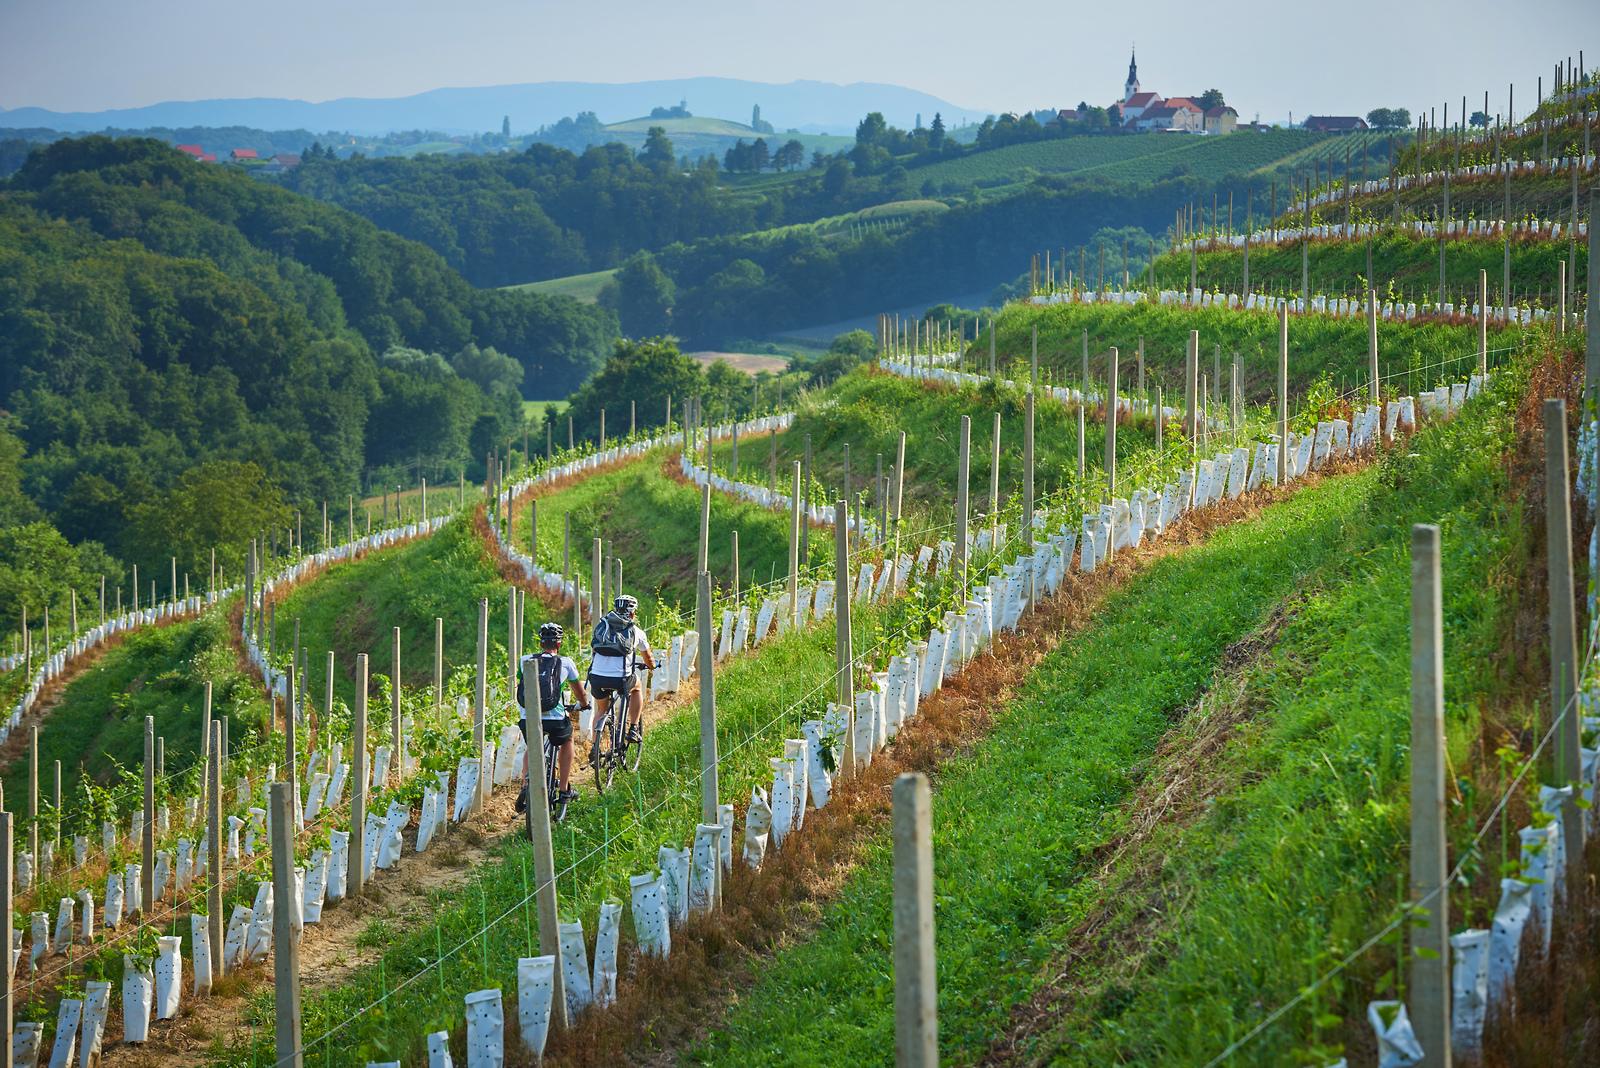 Wineyards of Jeruzalem in eastern Slovenia